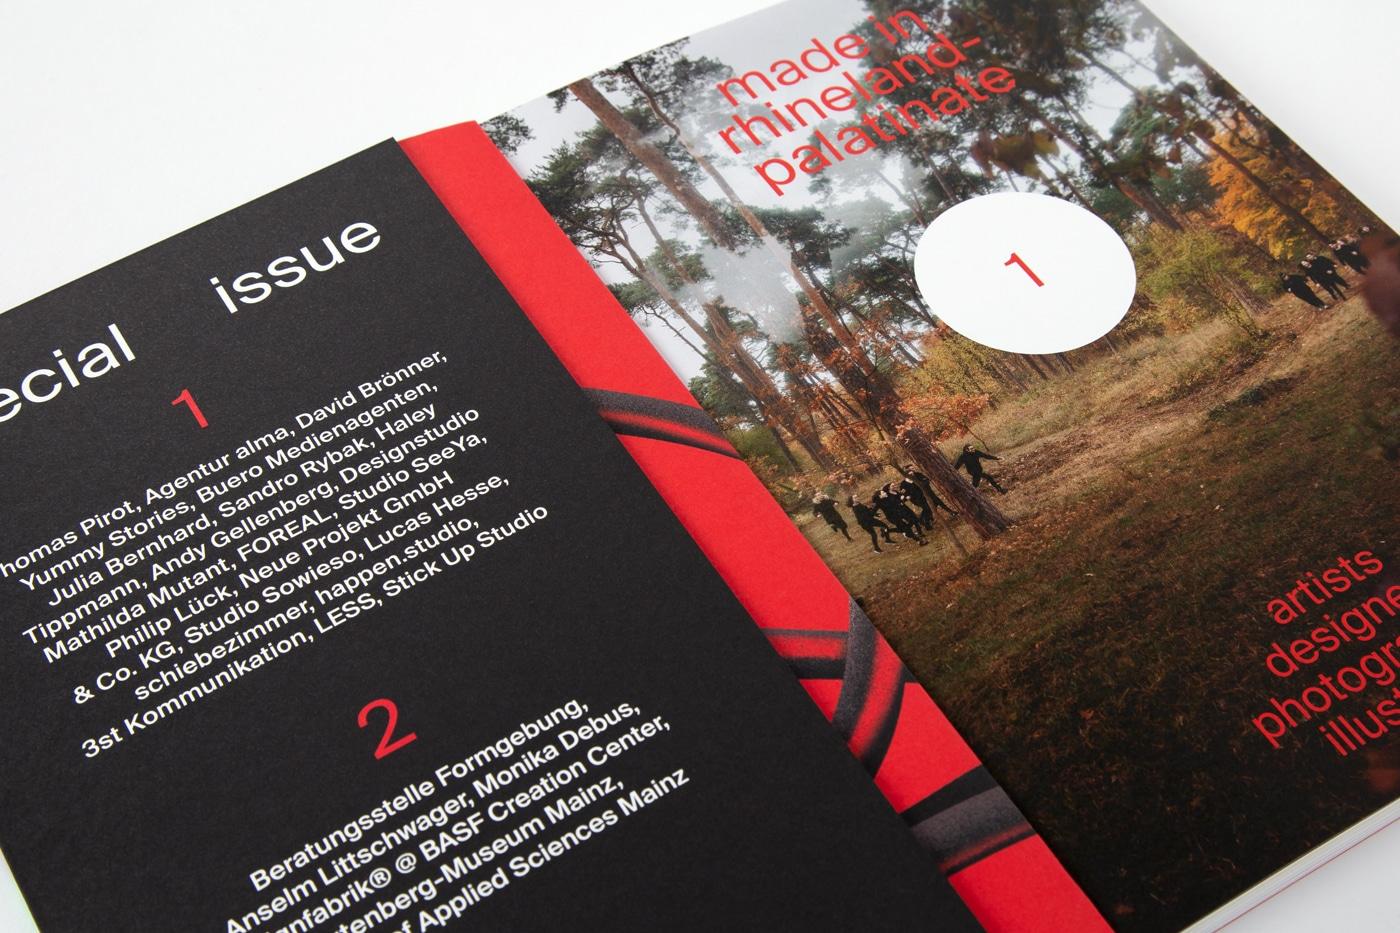 Slanted-Special-Issue-Rhineland-Palatinate_03.jpg